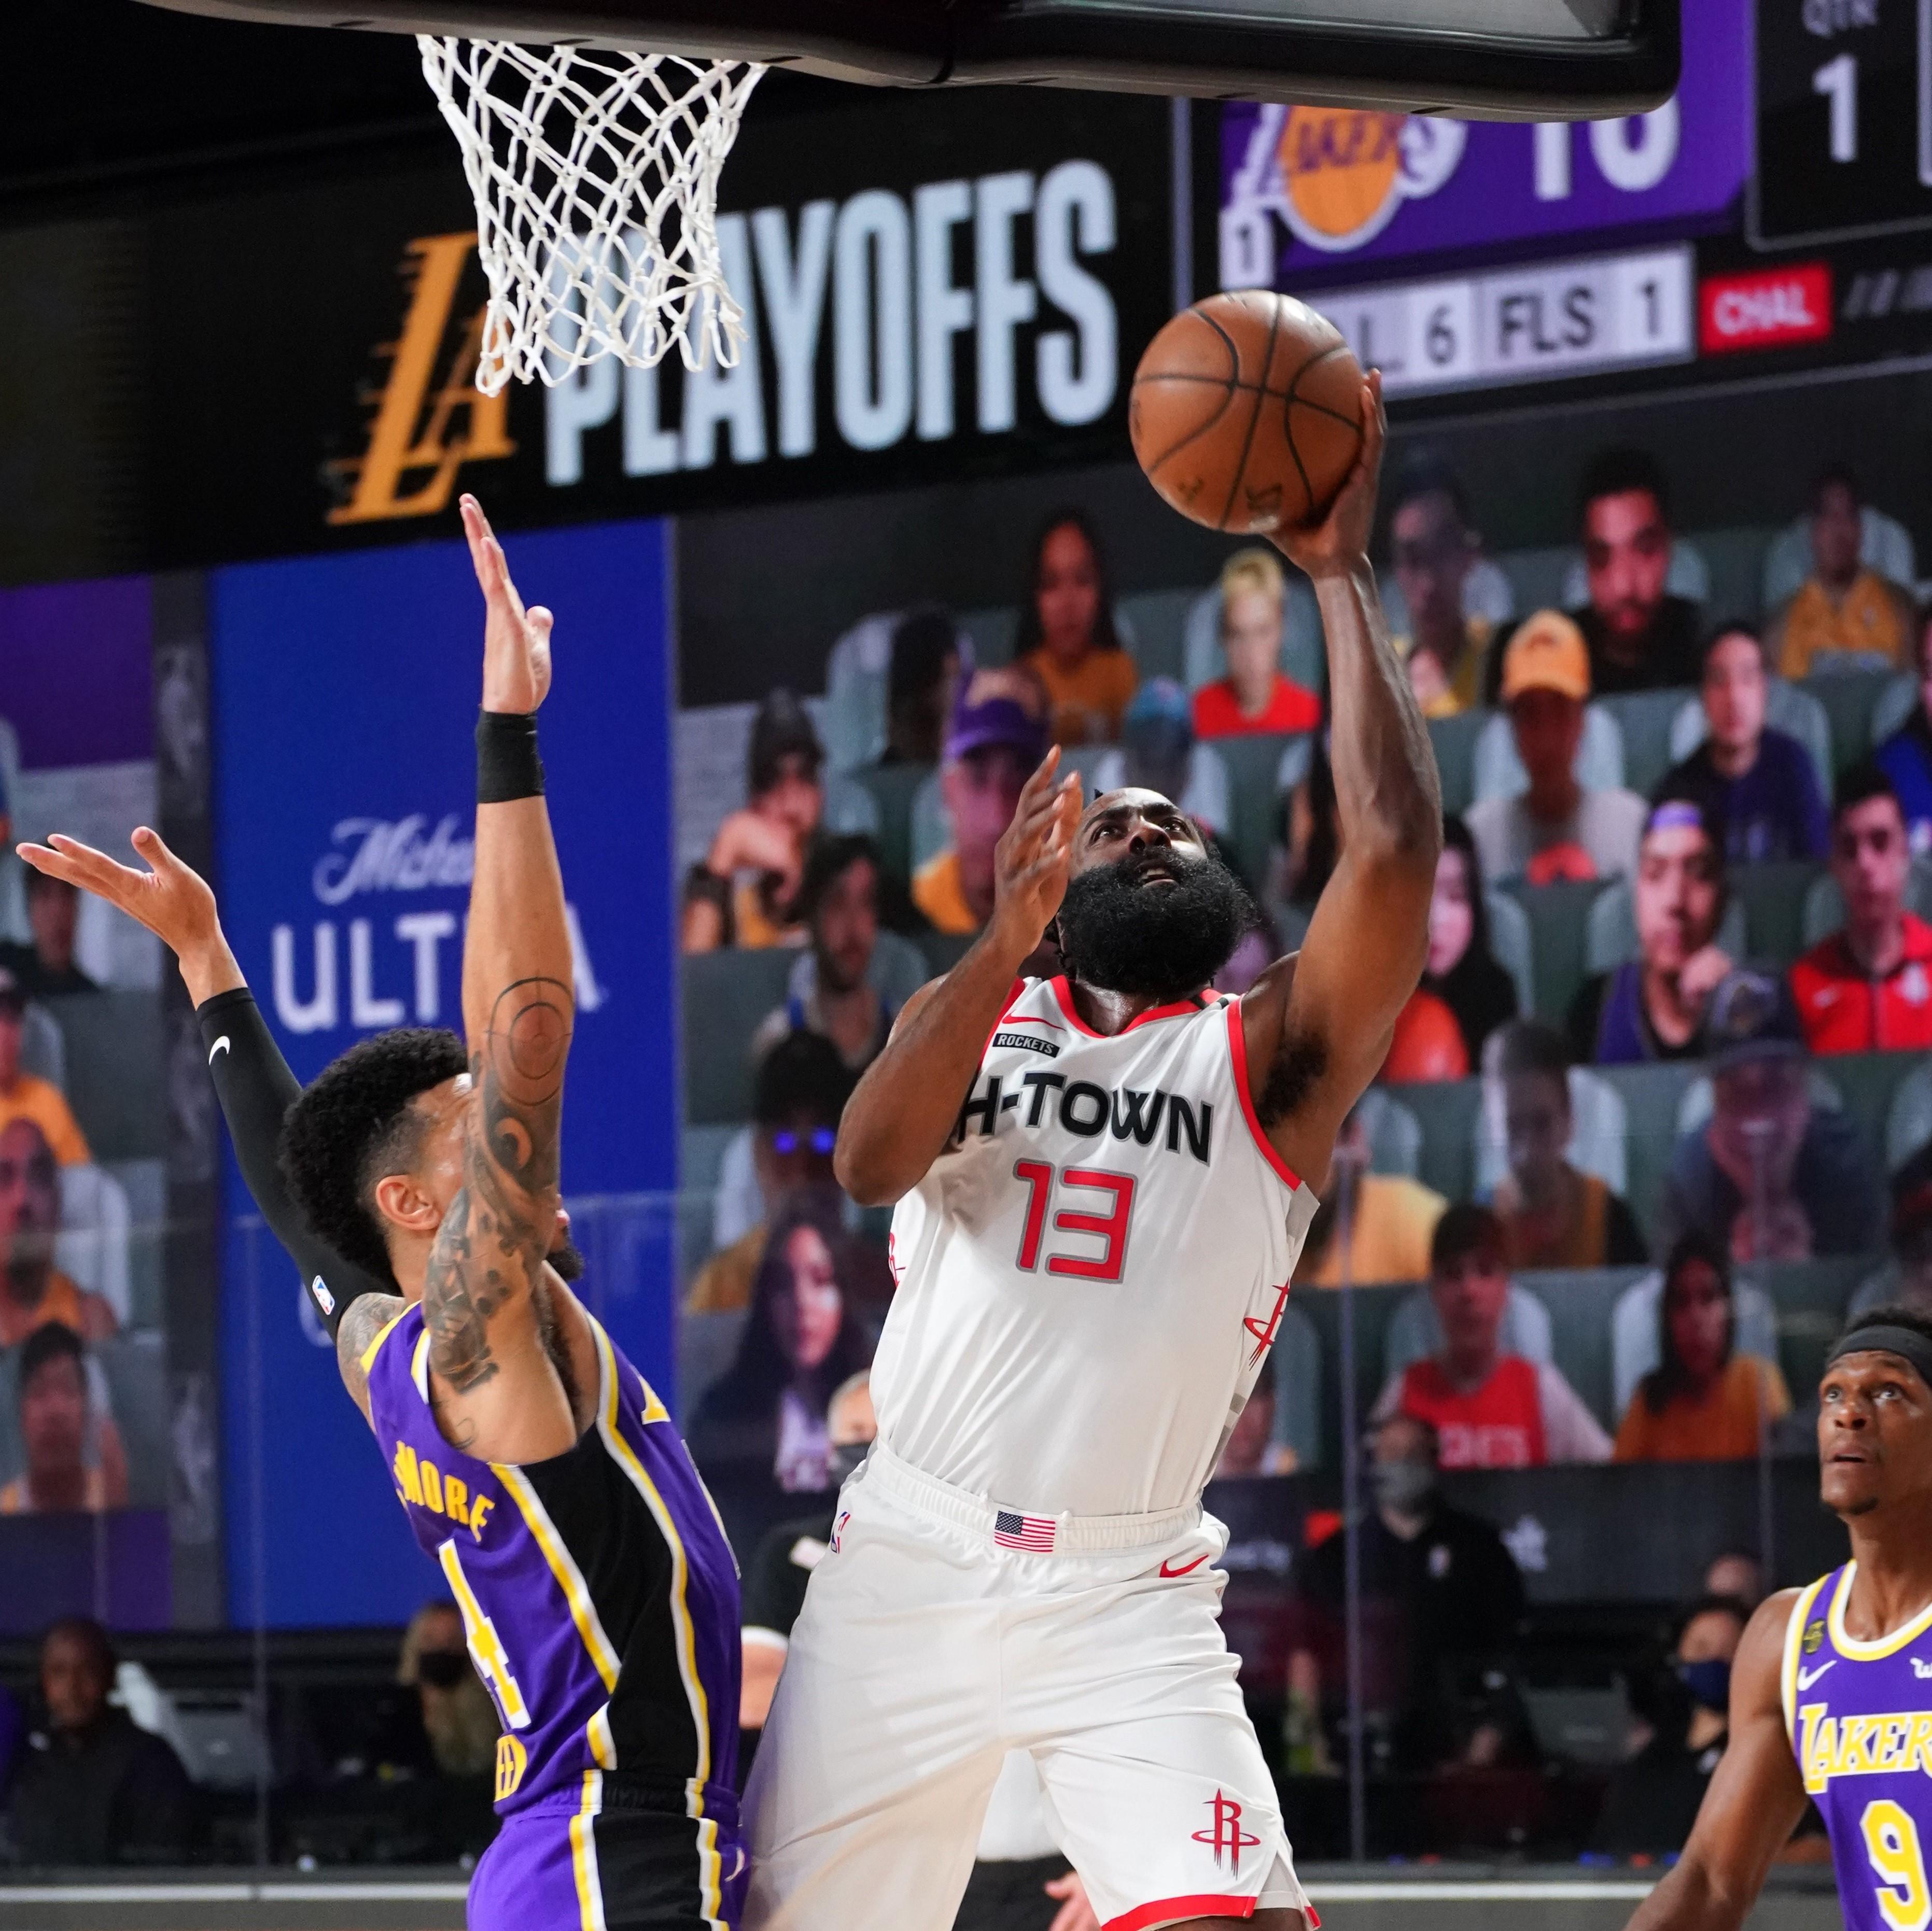 Nba Highlights On Sep 4 Better Prepared Rockets Beat Lakers Cgtn